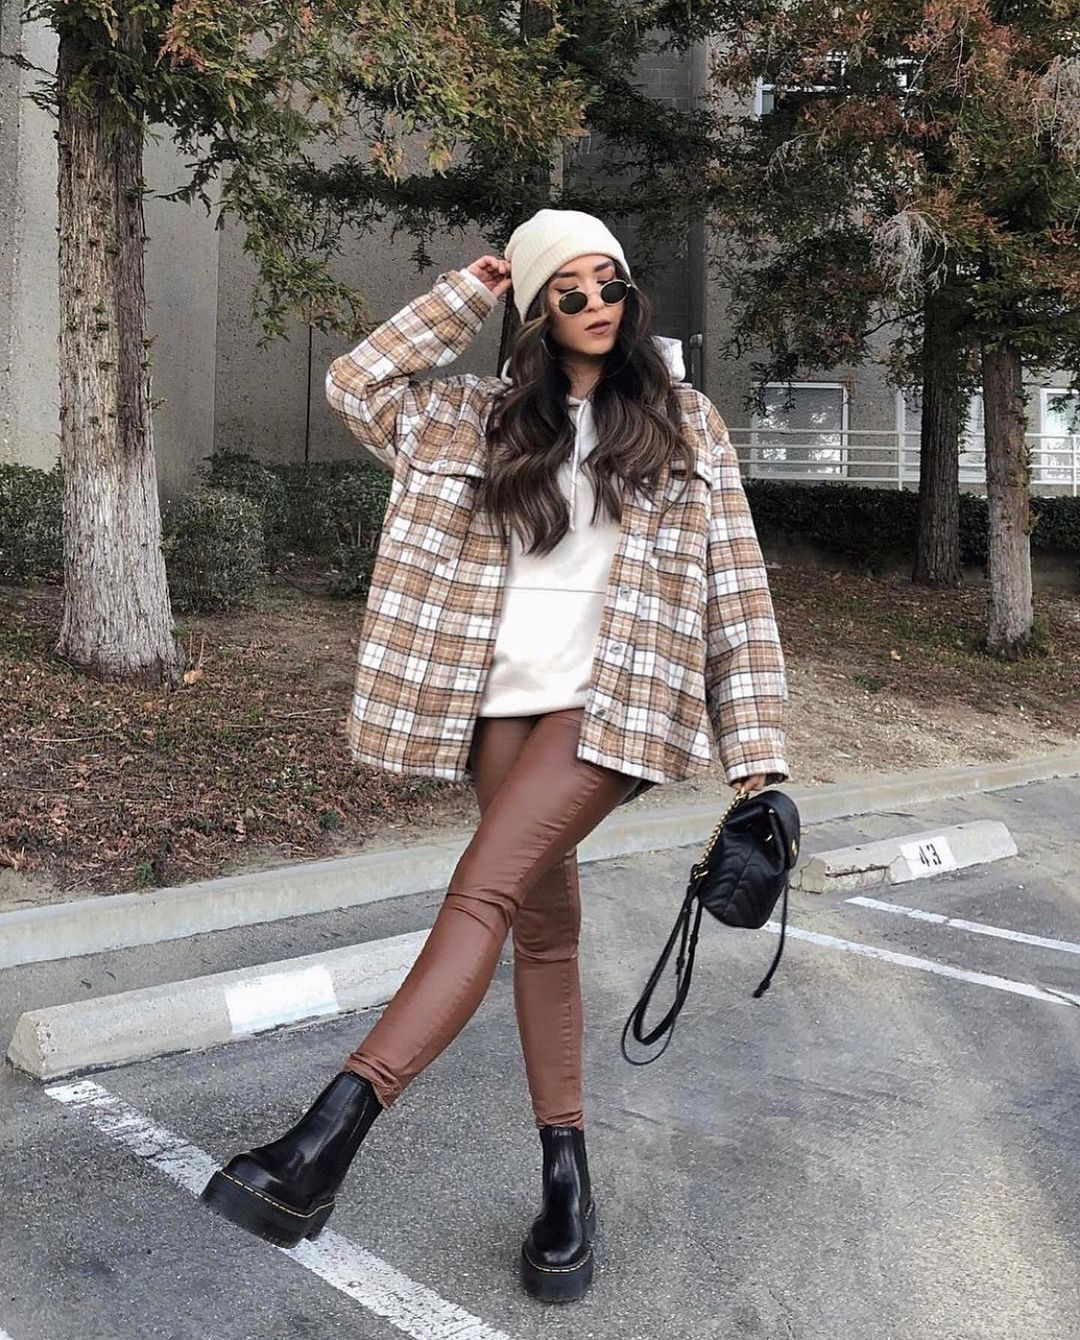 Classy Wear Ideas For Girls Fashion 2021 Tiktok Inspiration Spring In 2021 Fashion Korean Outfits Classy Wear